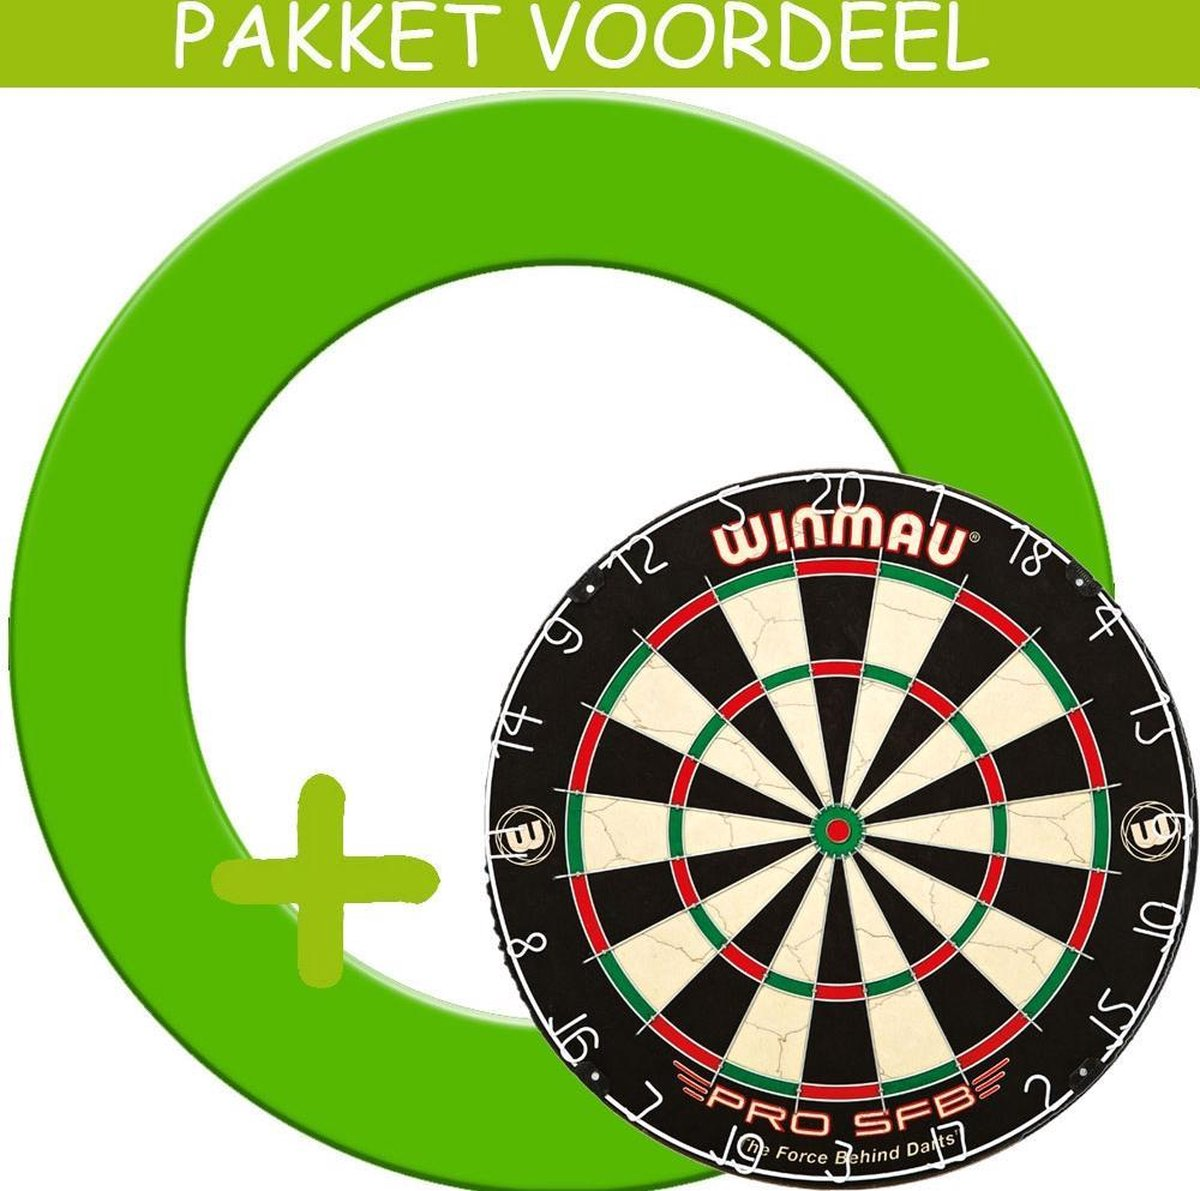 Dartbord Surround VoordeelPakket - Pro SFB - Rubberen Surround-- (Groen)